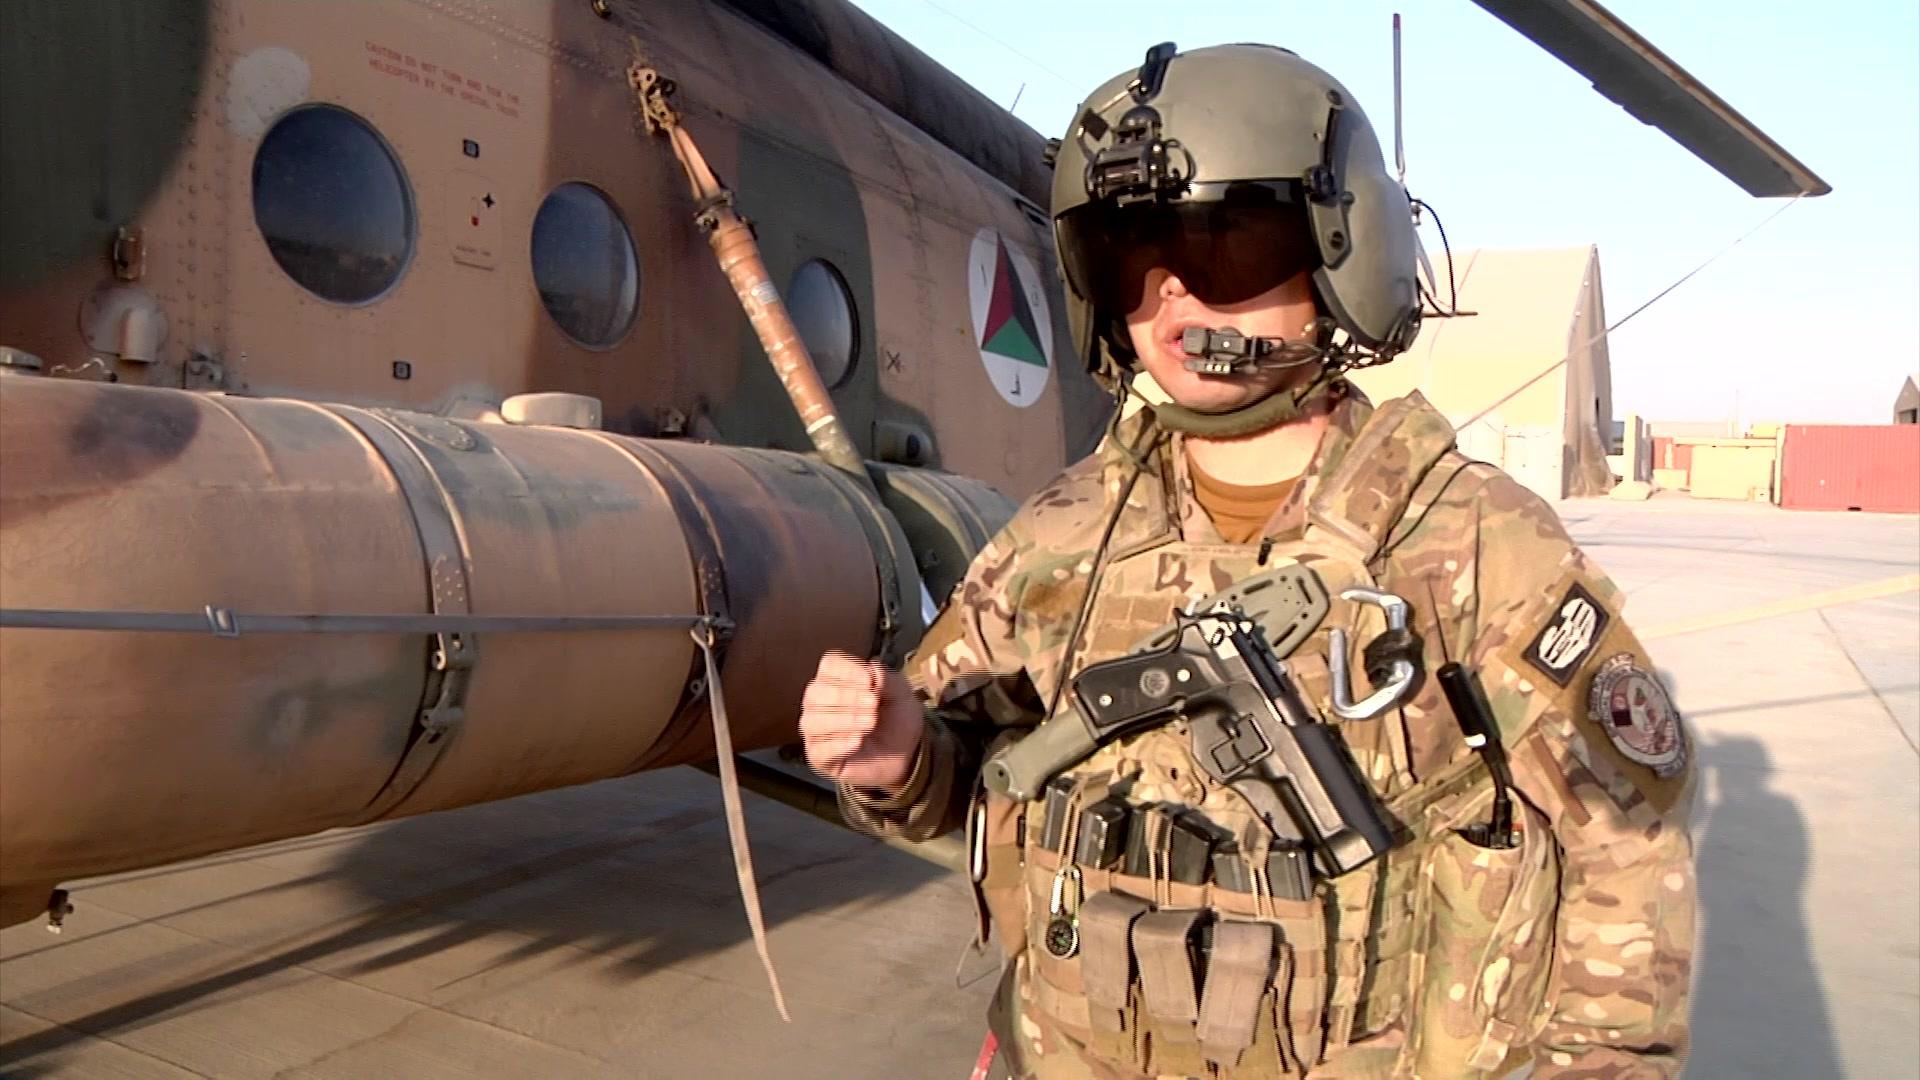 all jordan shoes 1-32 infantry staff 784215